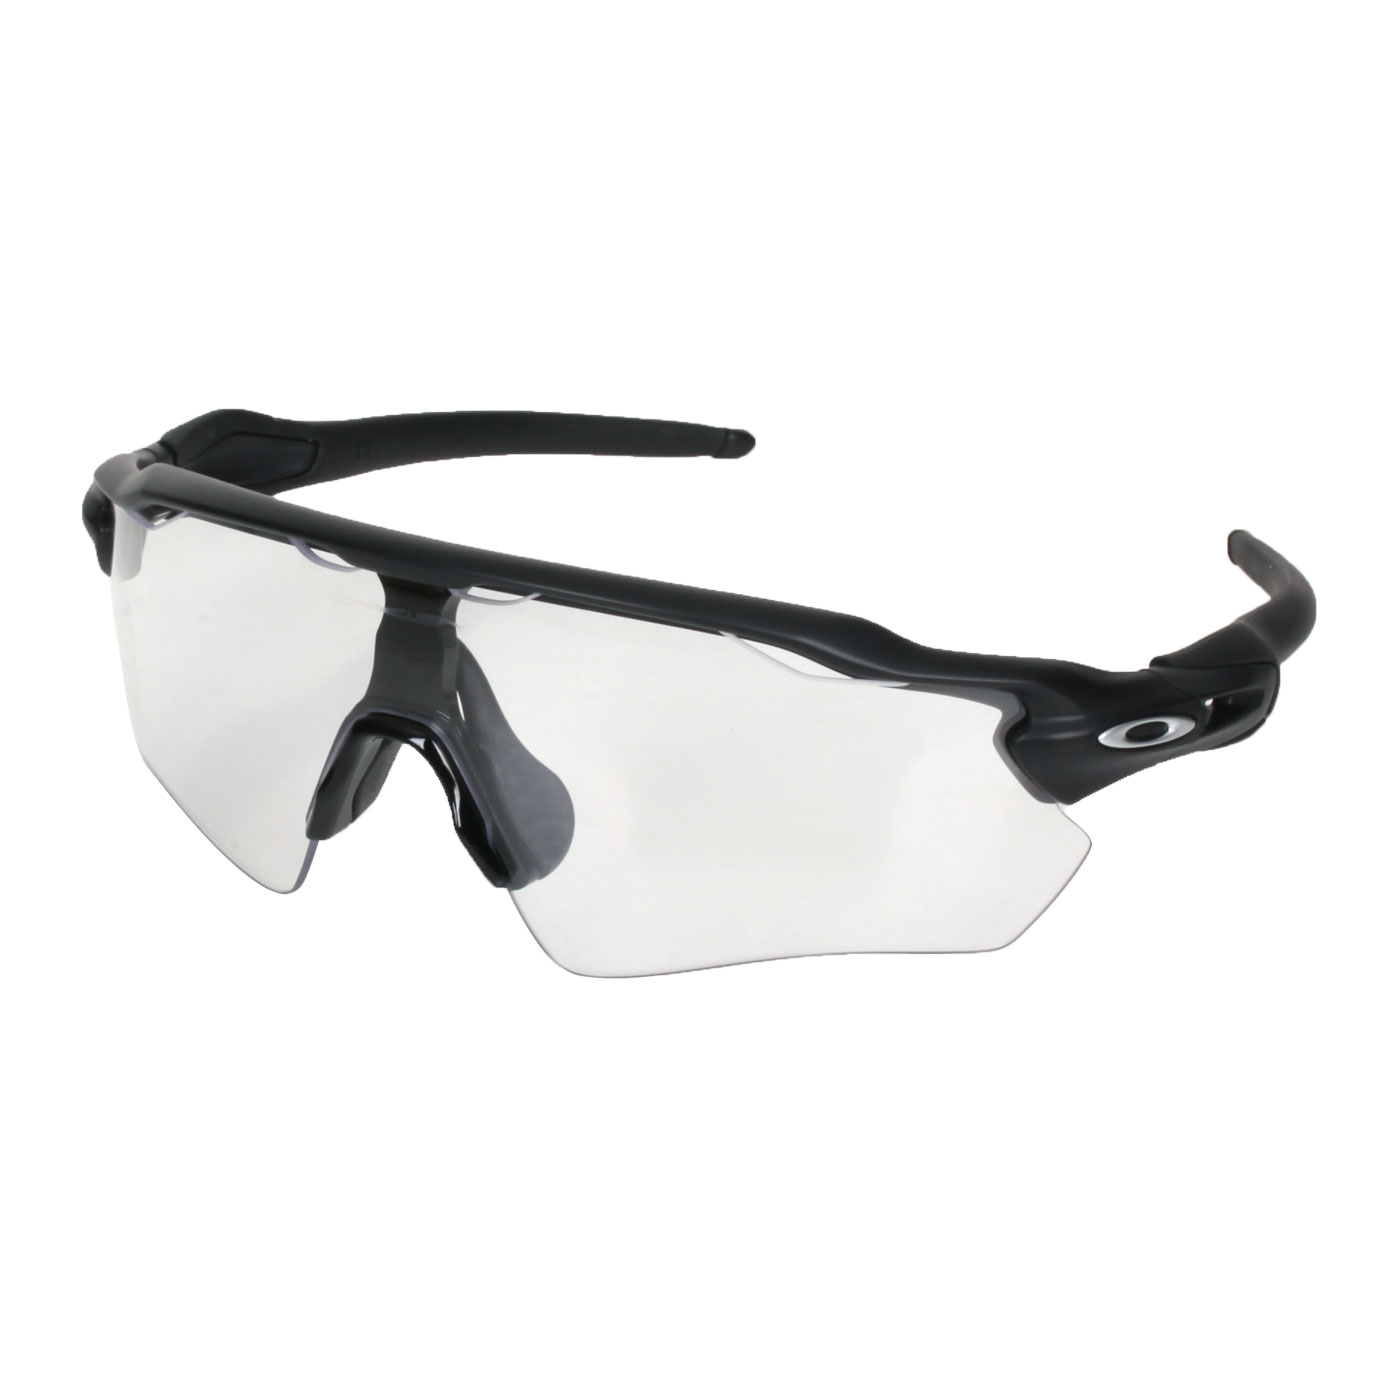 OAKLEY RADAR EV PATH 一般太陽眼鏡(附硬盒鼻墊) OAK-OO9208-7438